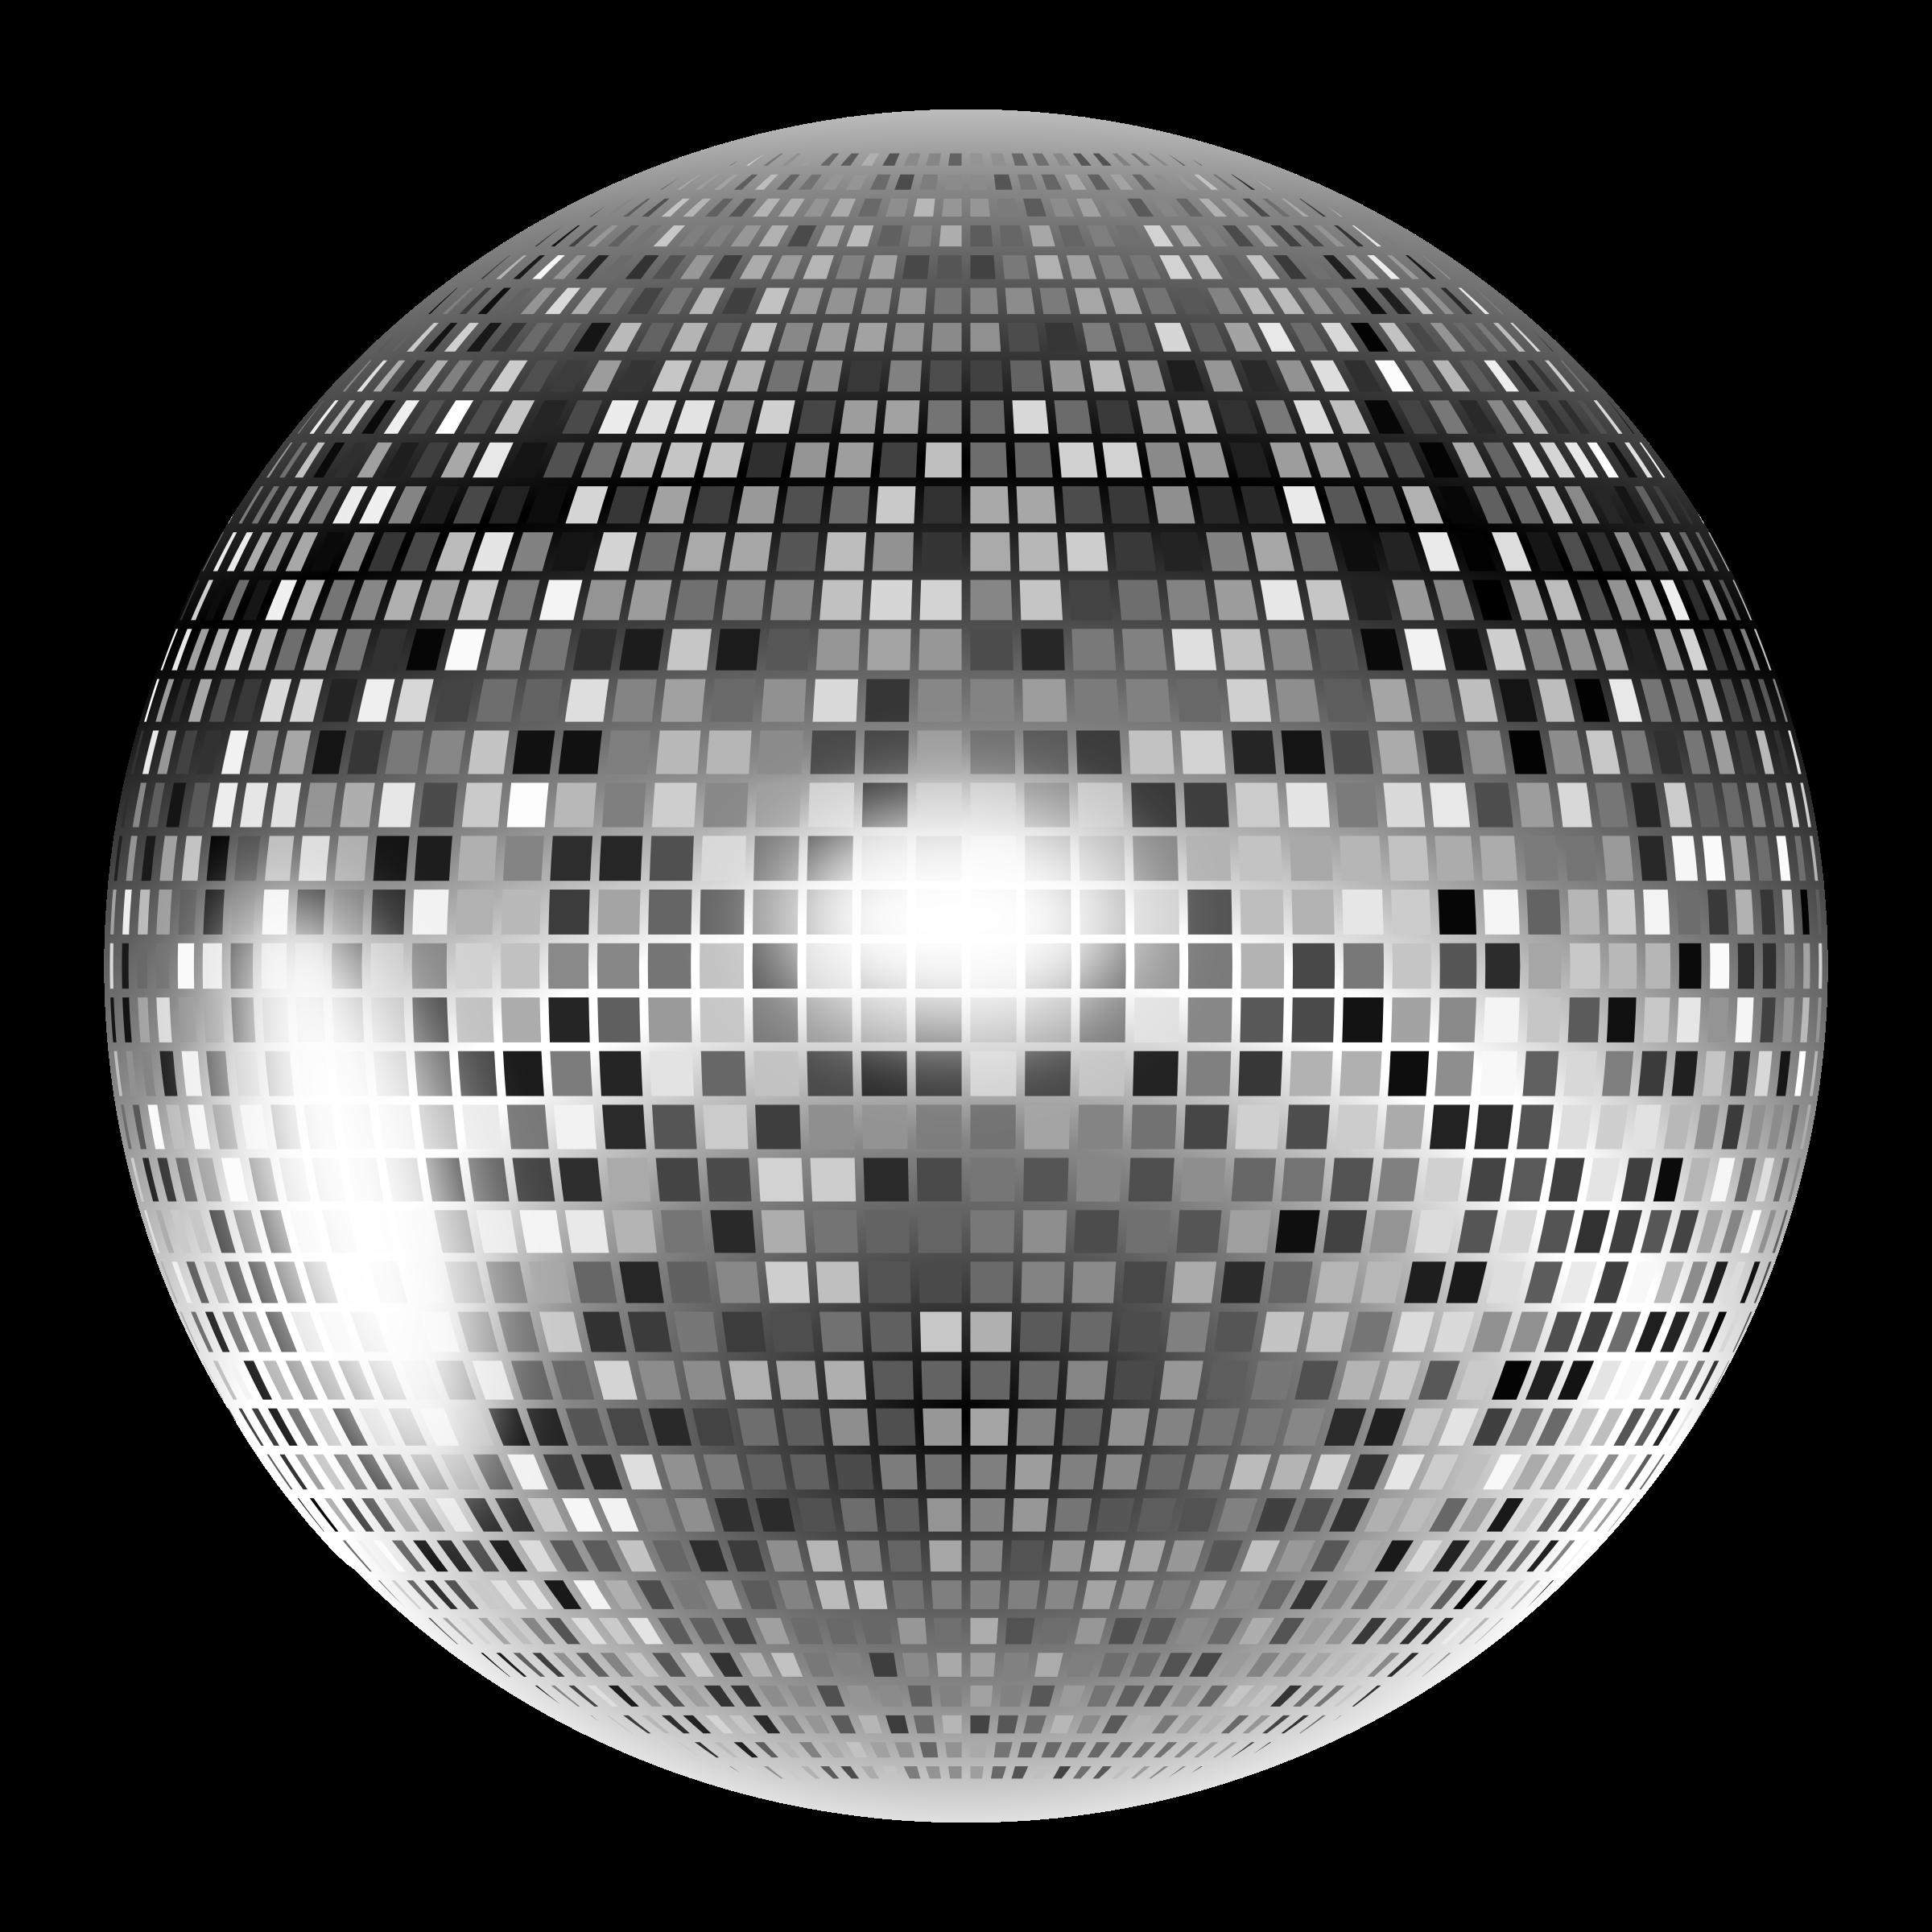 Bola disco png - Imagu...